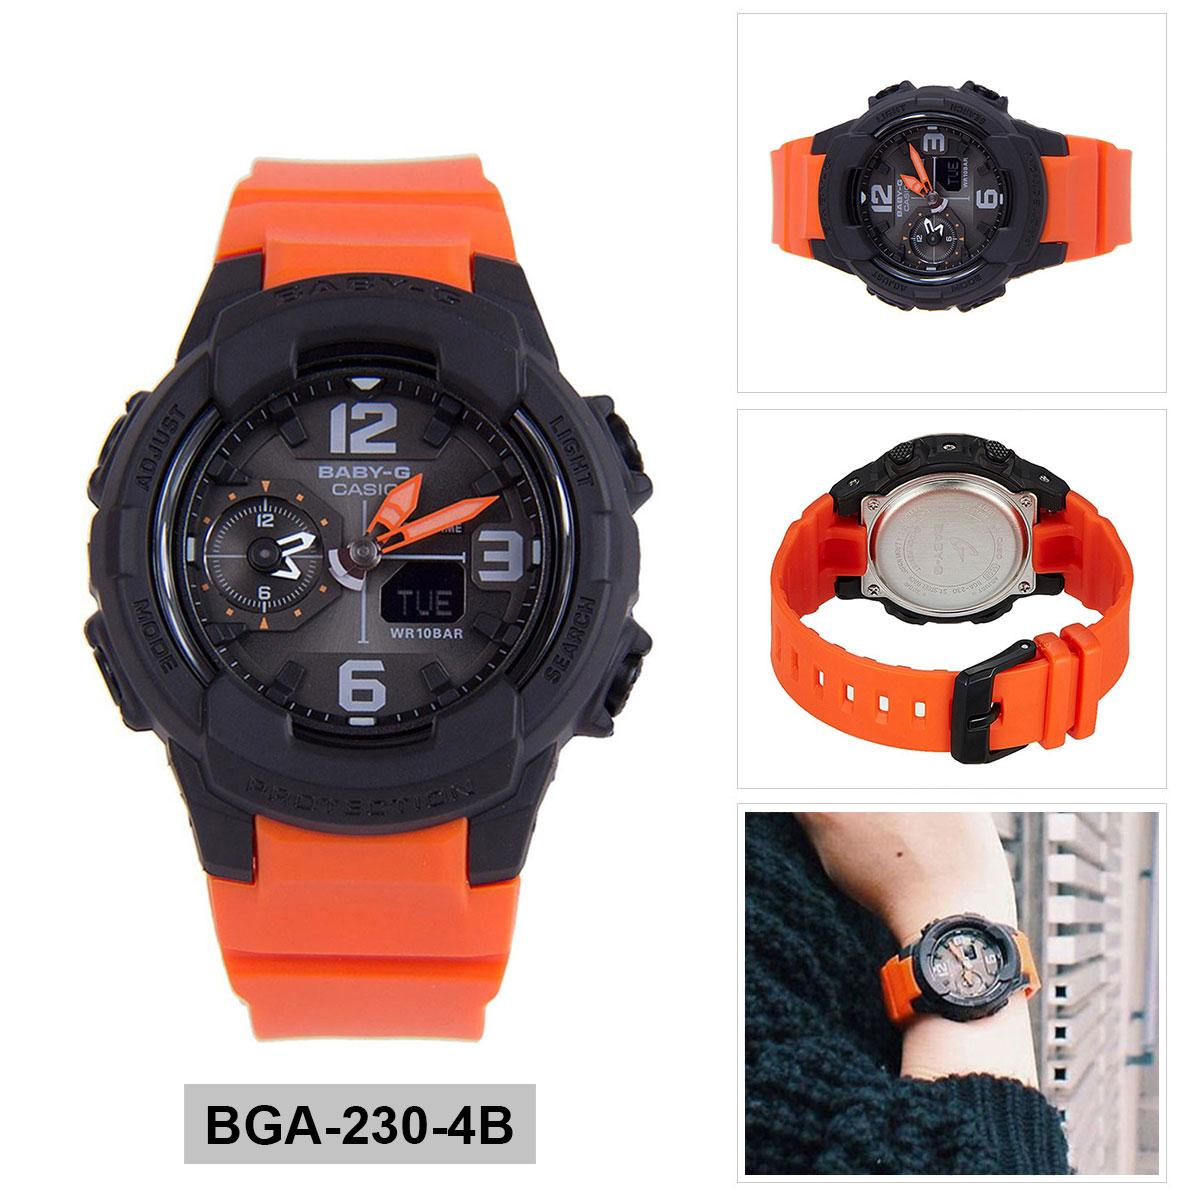 Buy Sell Cheapest Casio Orange Resin Best Quality Product Deals Baby G Bga 230 7b Original Case Strap Ladies 4b